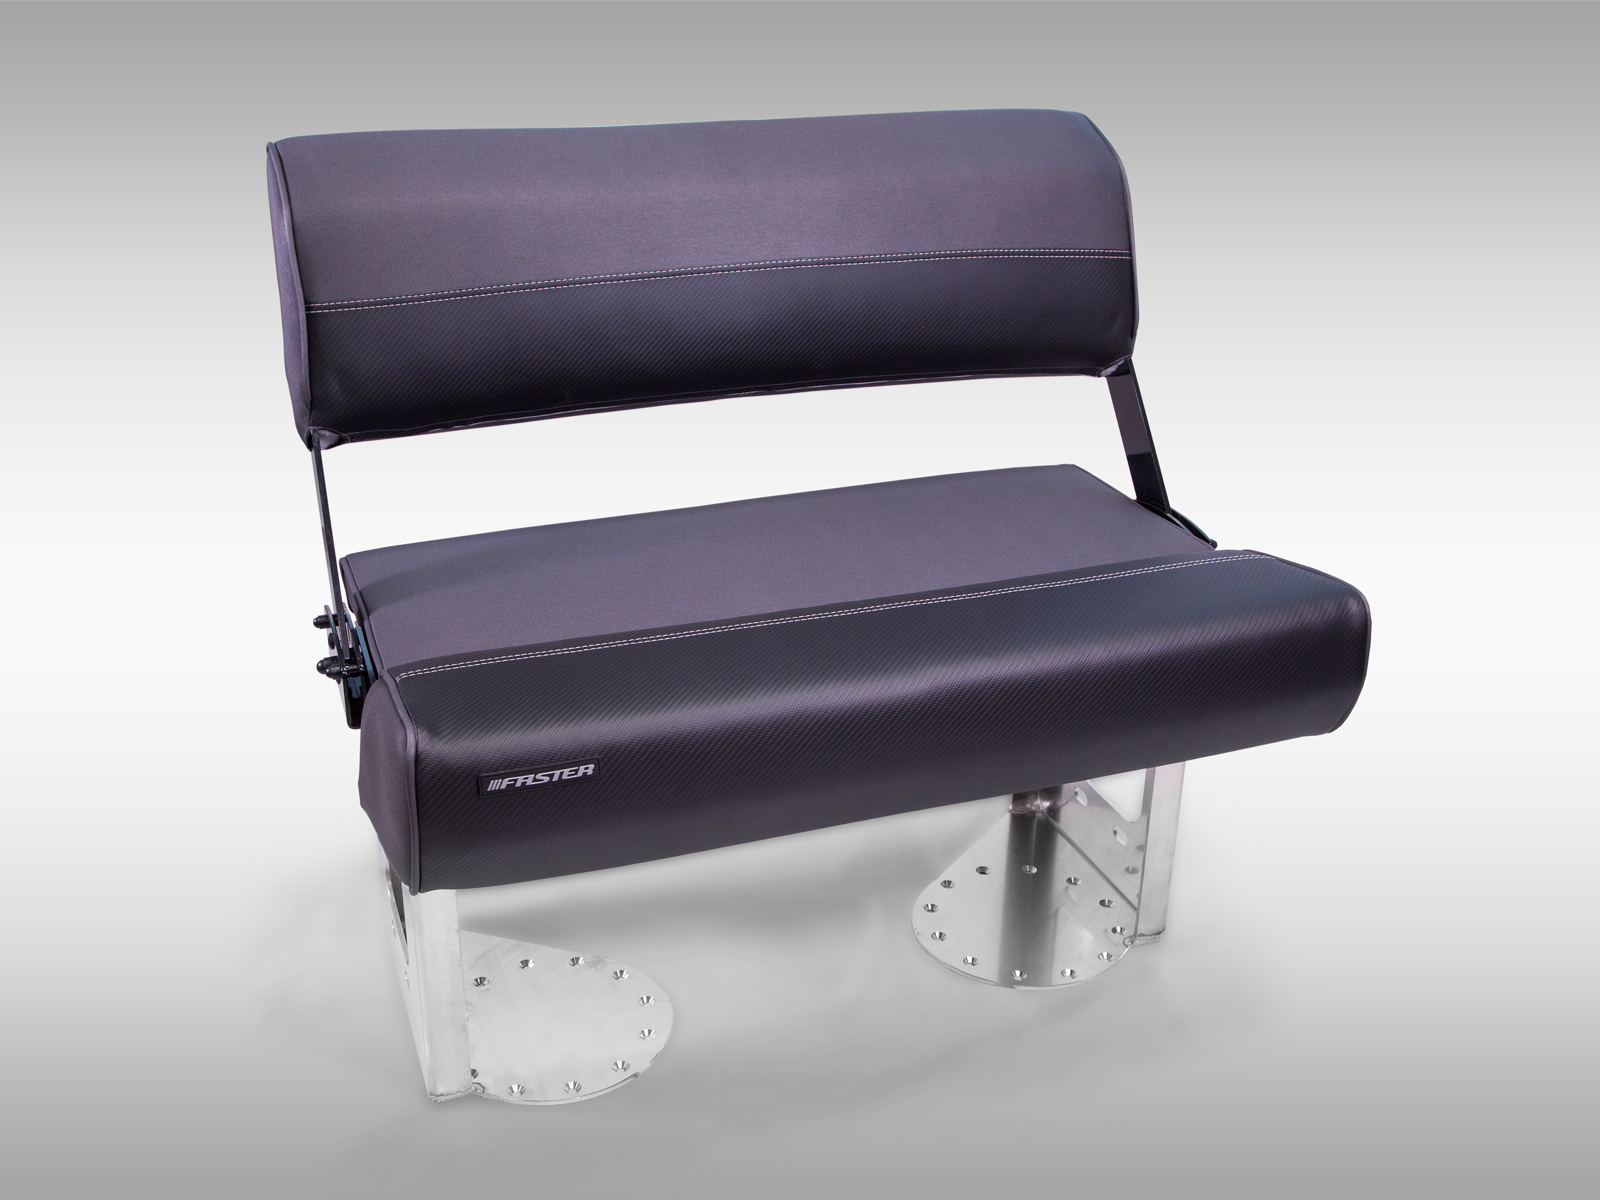 Swing-istuin, 80 cm - Istuimet - Lisävarusteet - Faster alumiiniveneet